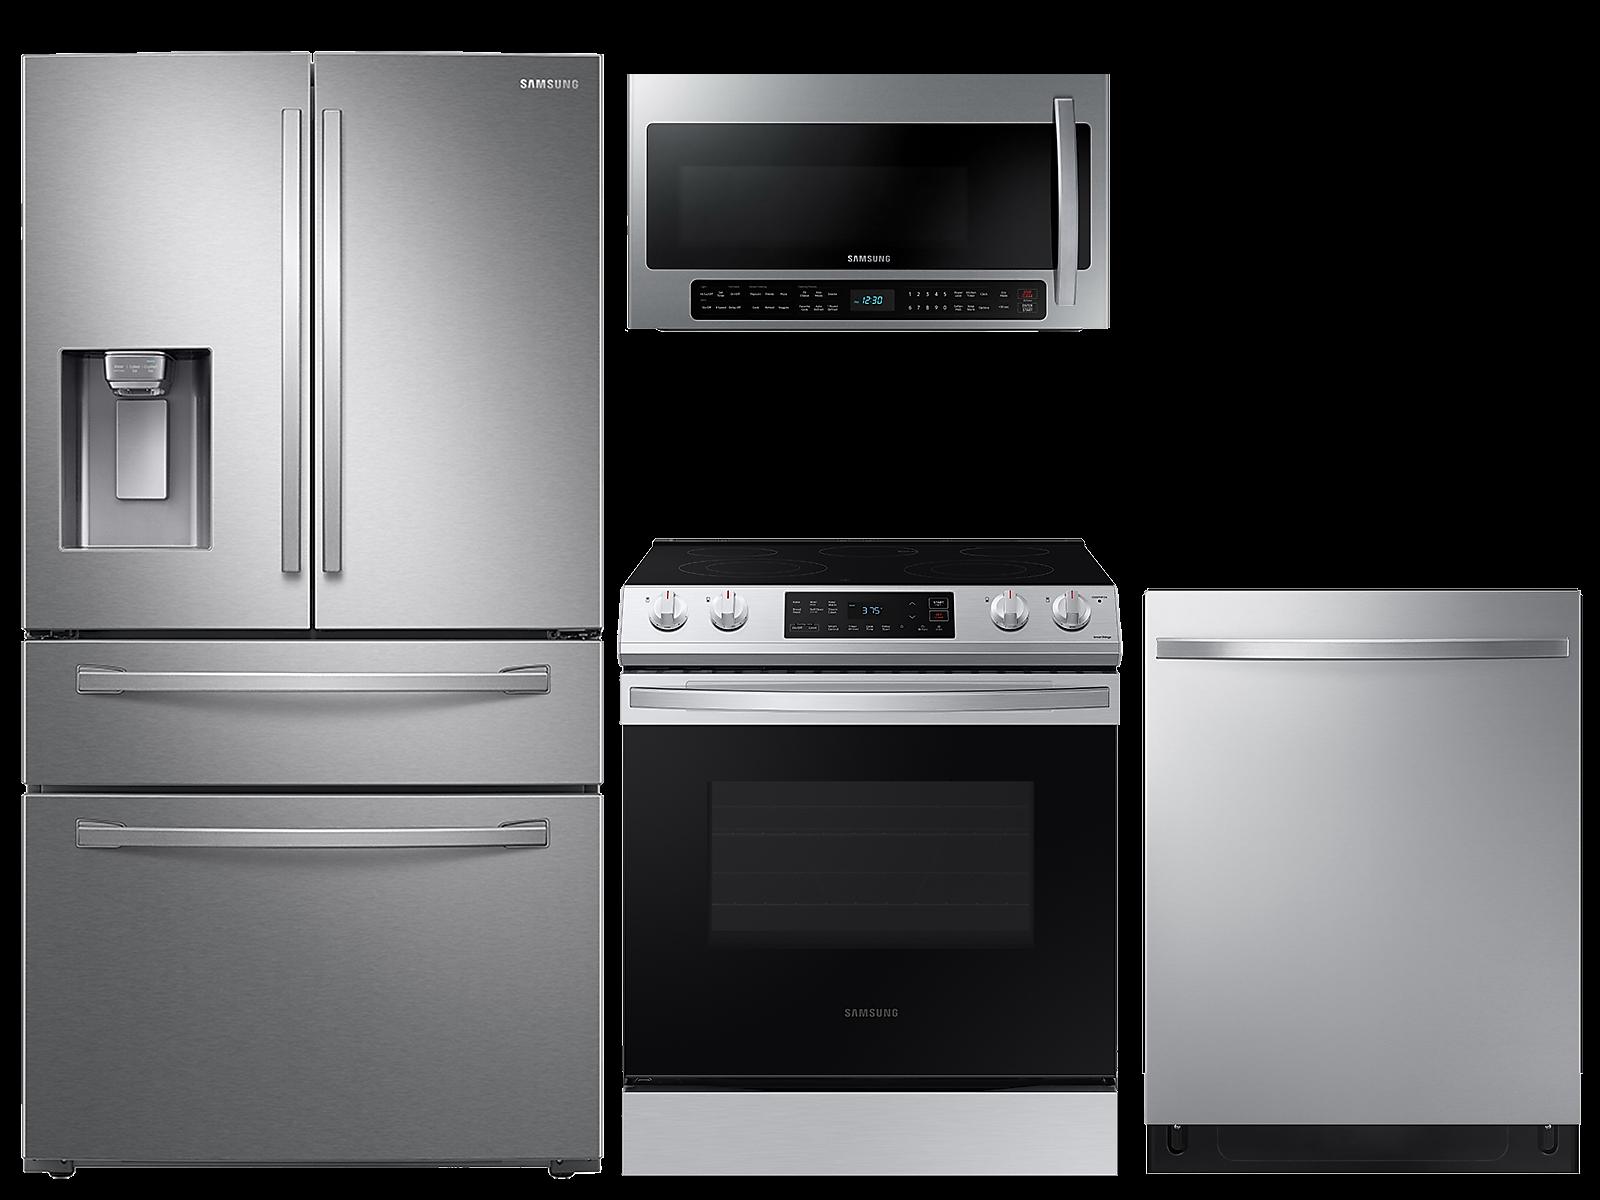 Samsung coupon: Samsung 28 cu. ft. 4-door refrigerator, 6.3 cu. ft. electric range, 2.1 cu. ft. microwave and 48 dBA modern-look dishwasher package